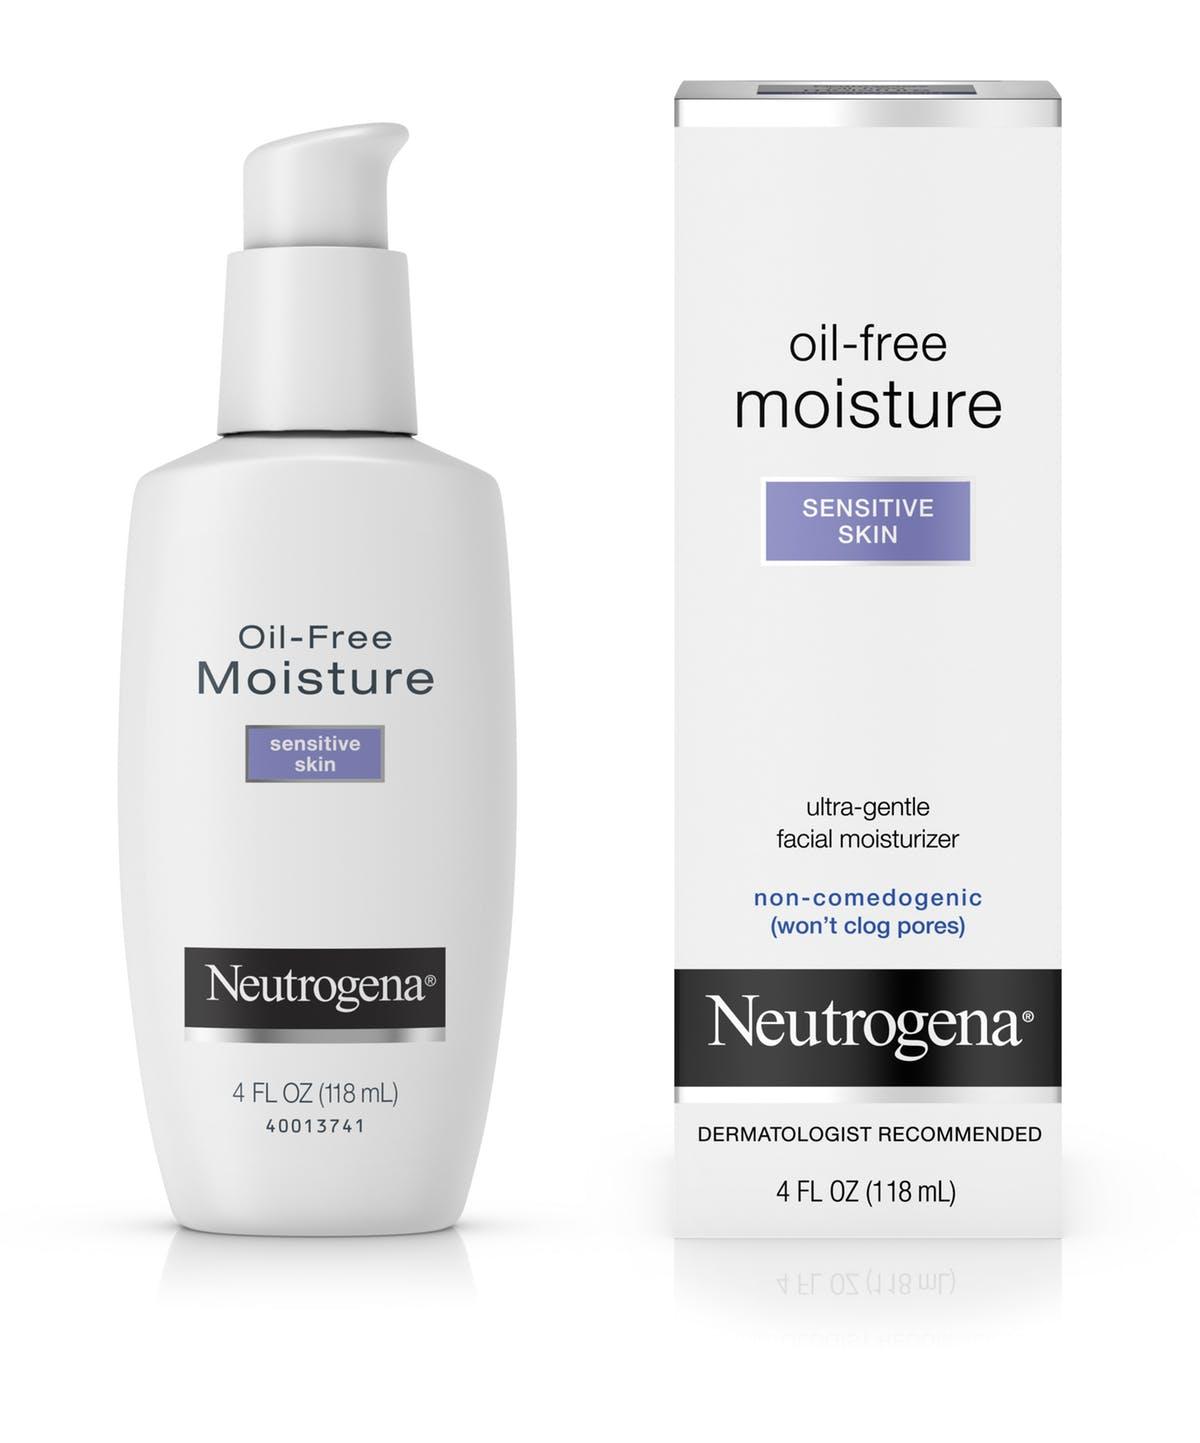 Neutrogena Oil-Free Face Moisturizer For Sensitive Skin